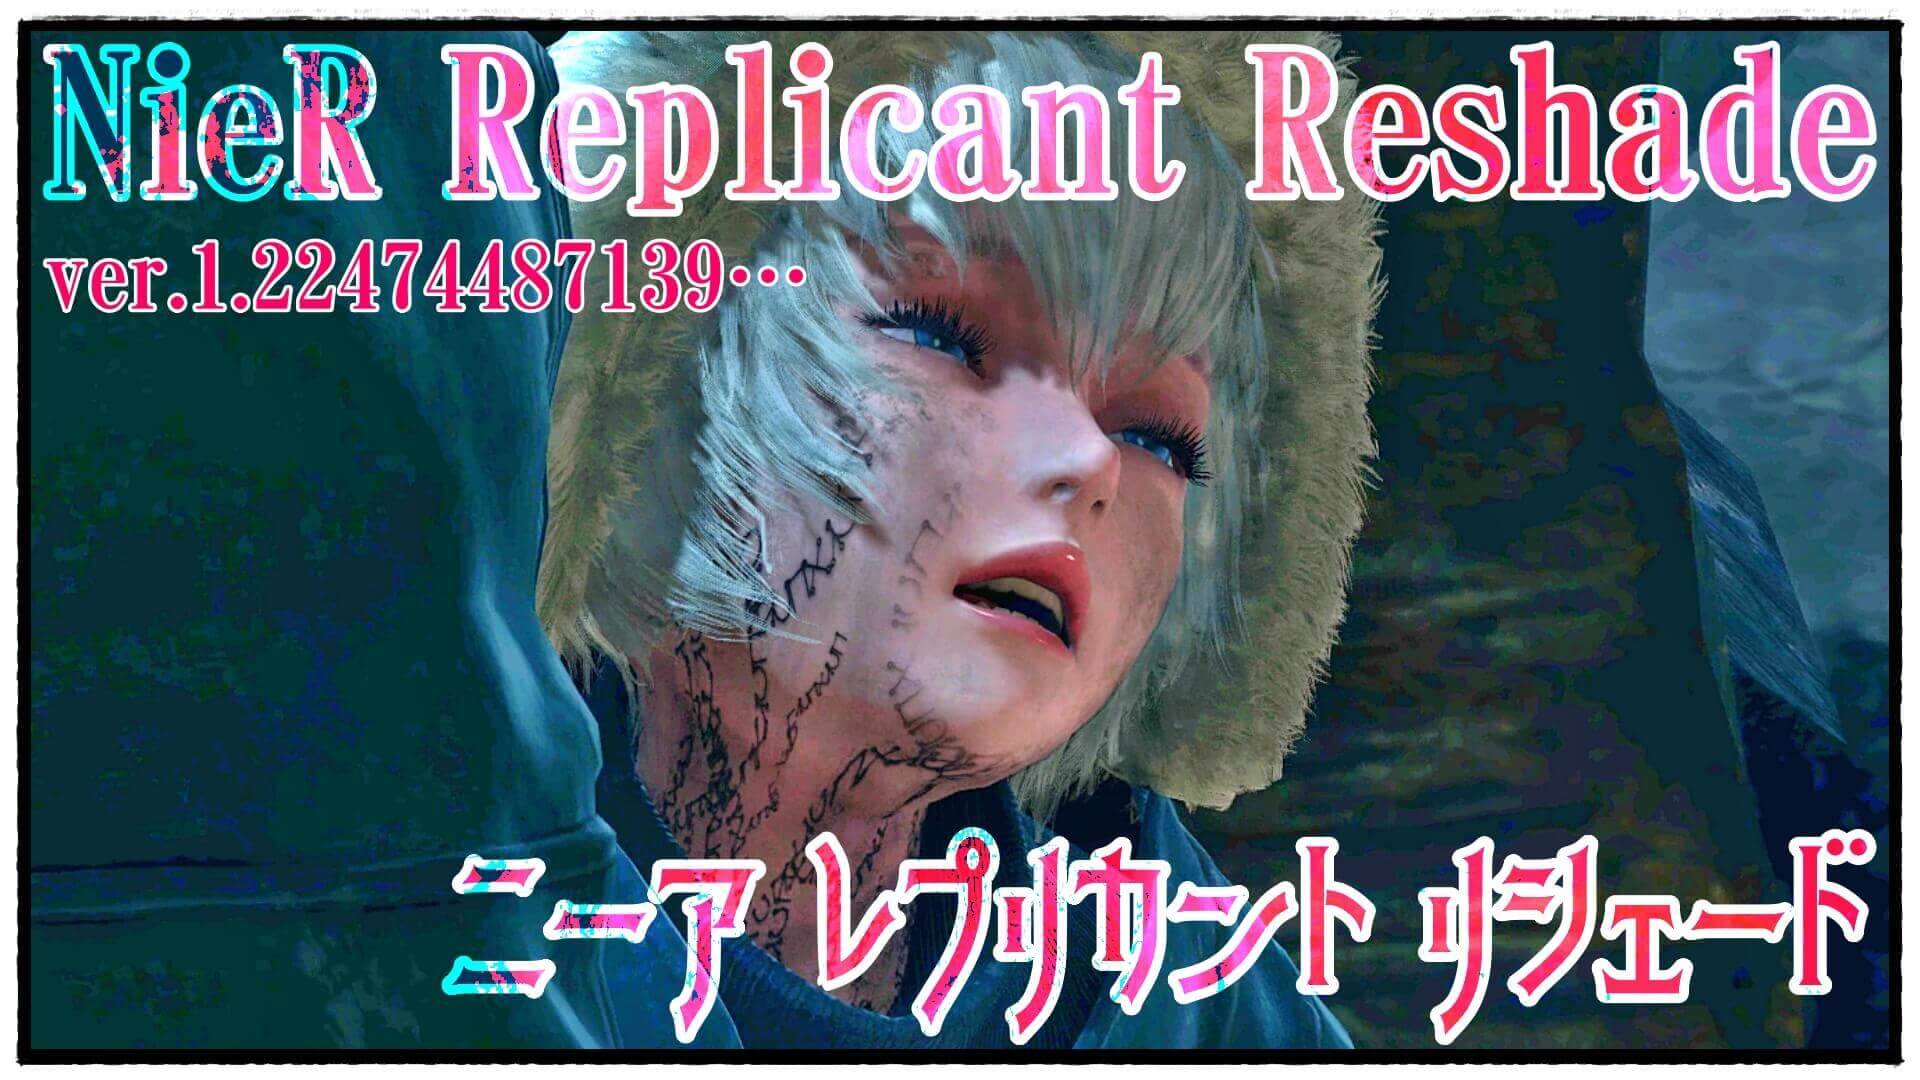 NieR Replicant ver1.22画質綺麗♡Reshade導入方法PC版まとめ